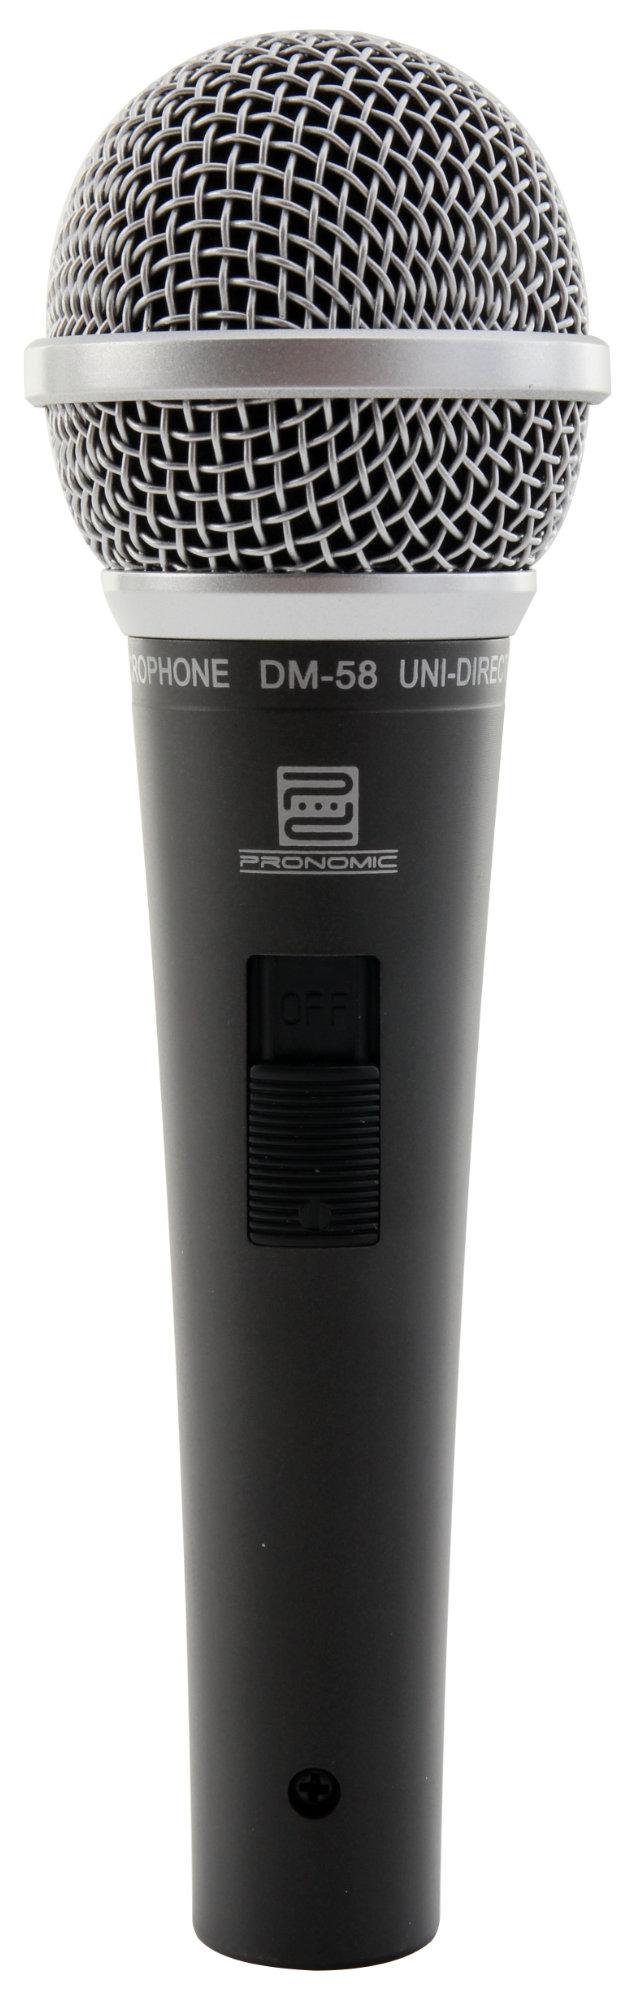 Pronomic DM-58 Vocal Mikrofon mit Schalter